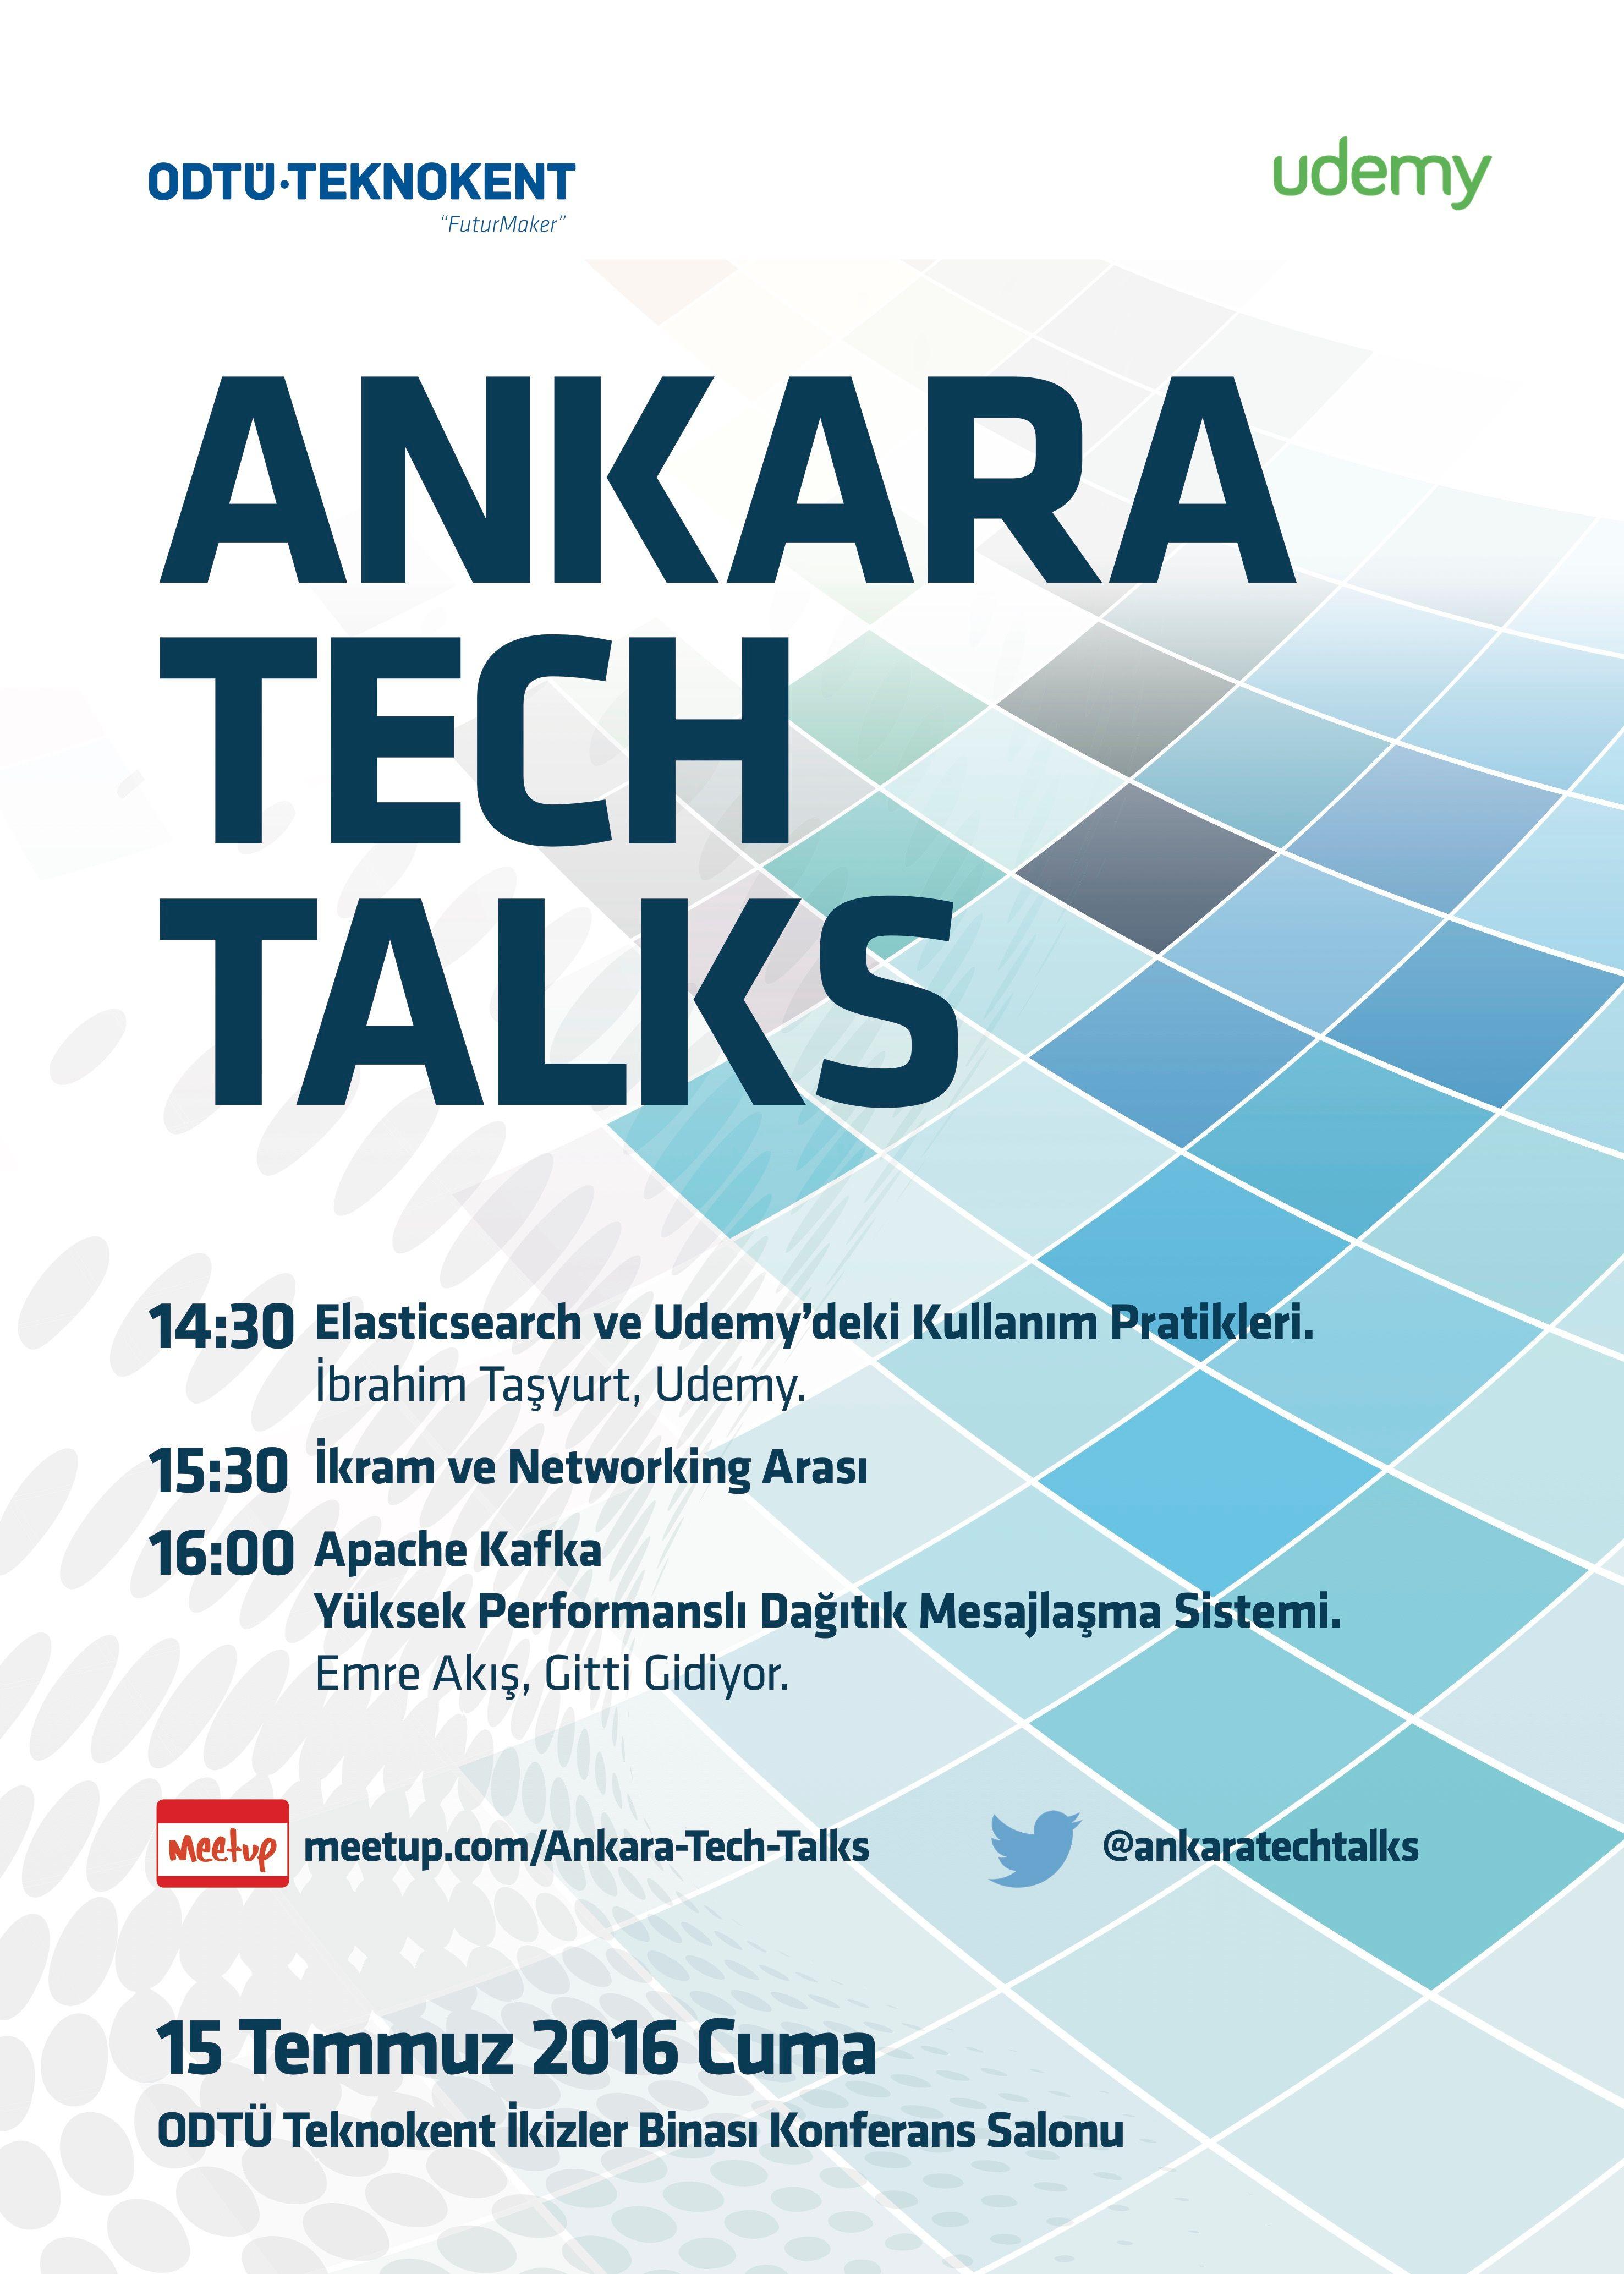 Photos - Ankara Tech Talks (Ankara) | Meetup